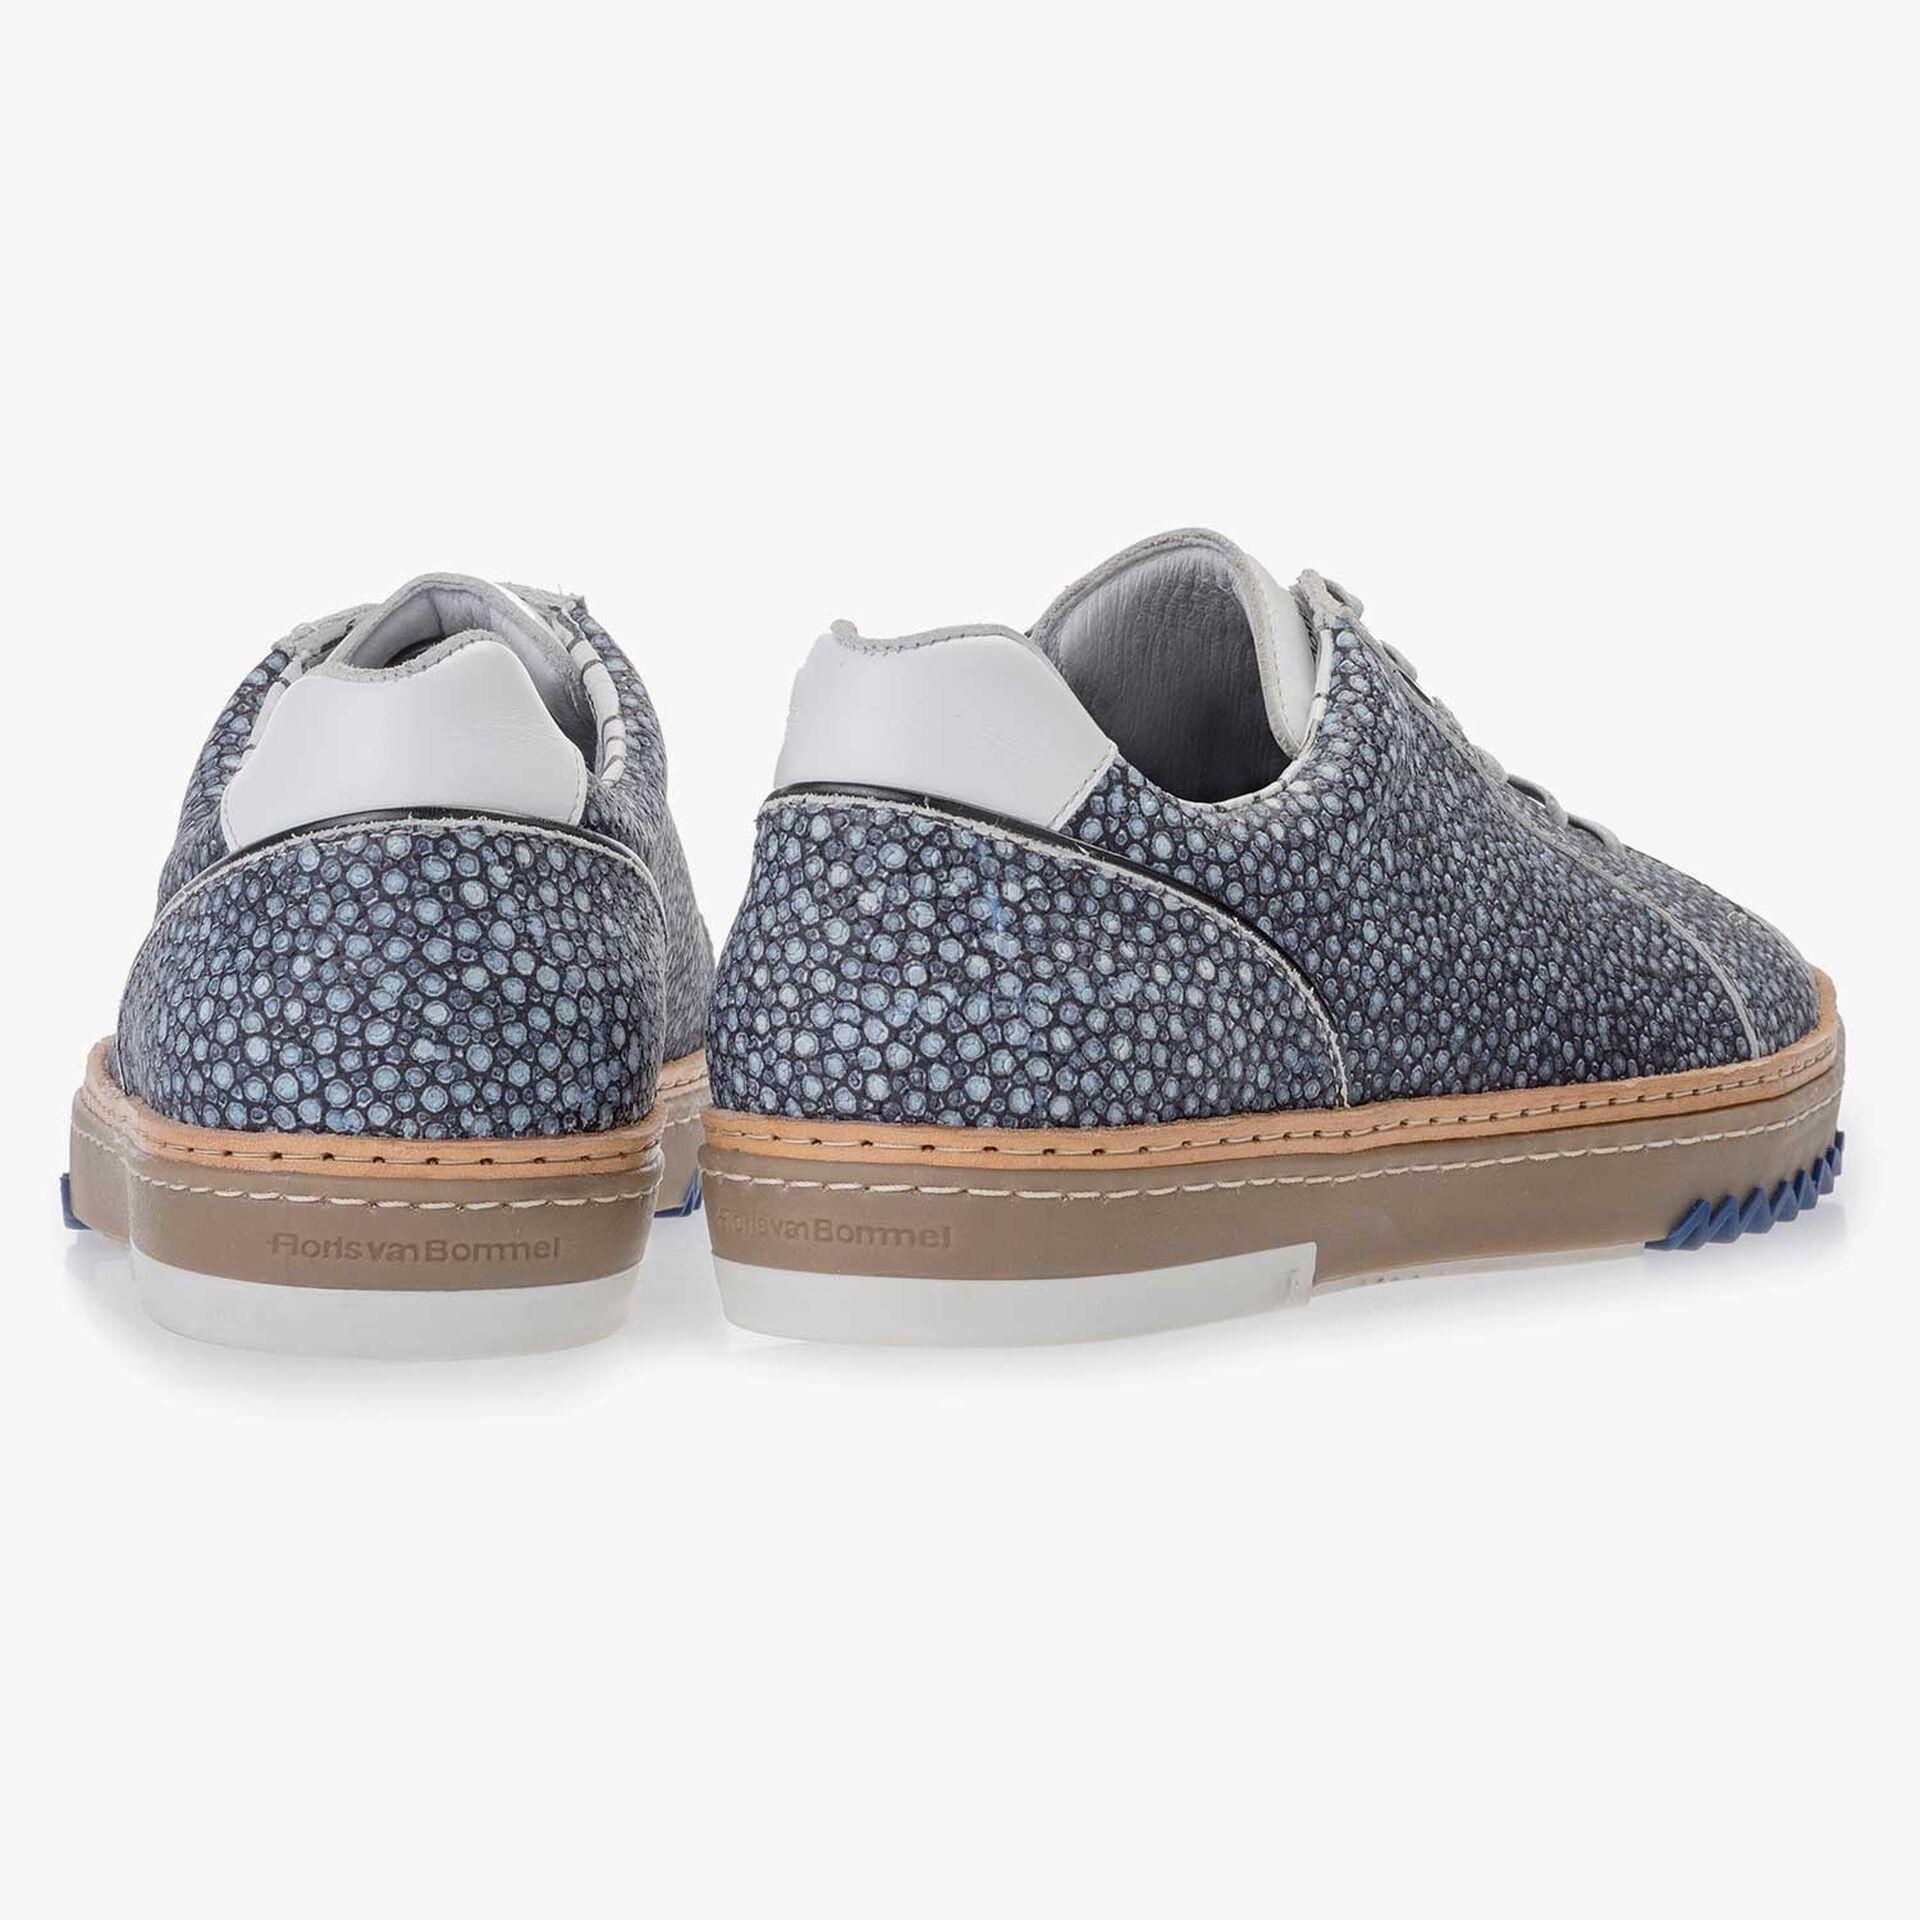 Blue, patterned leather sneaker